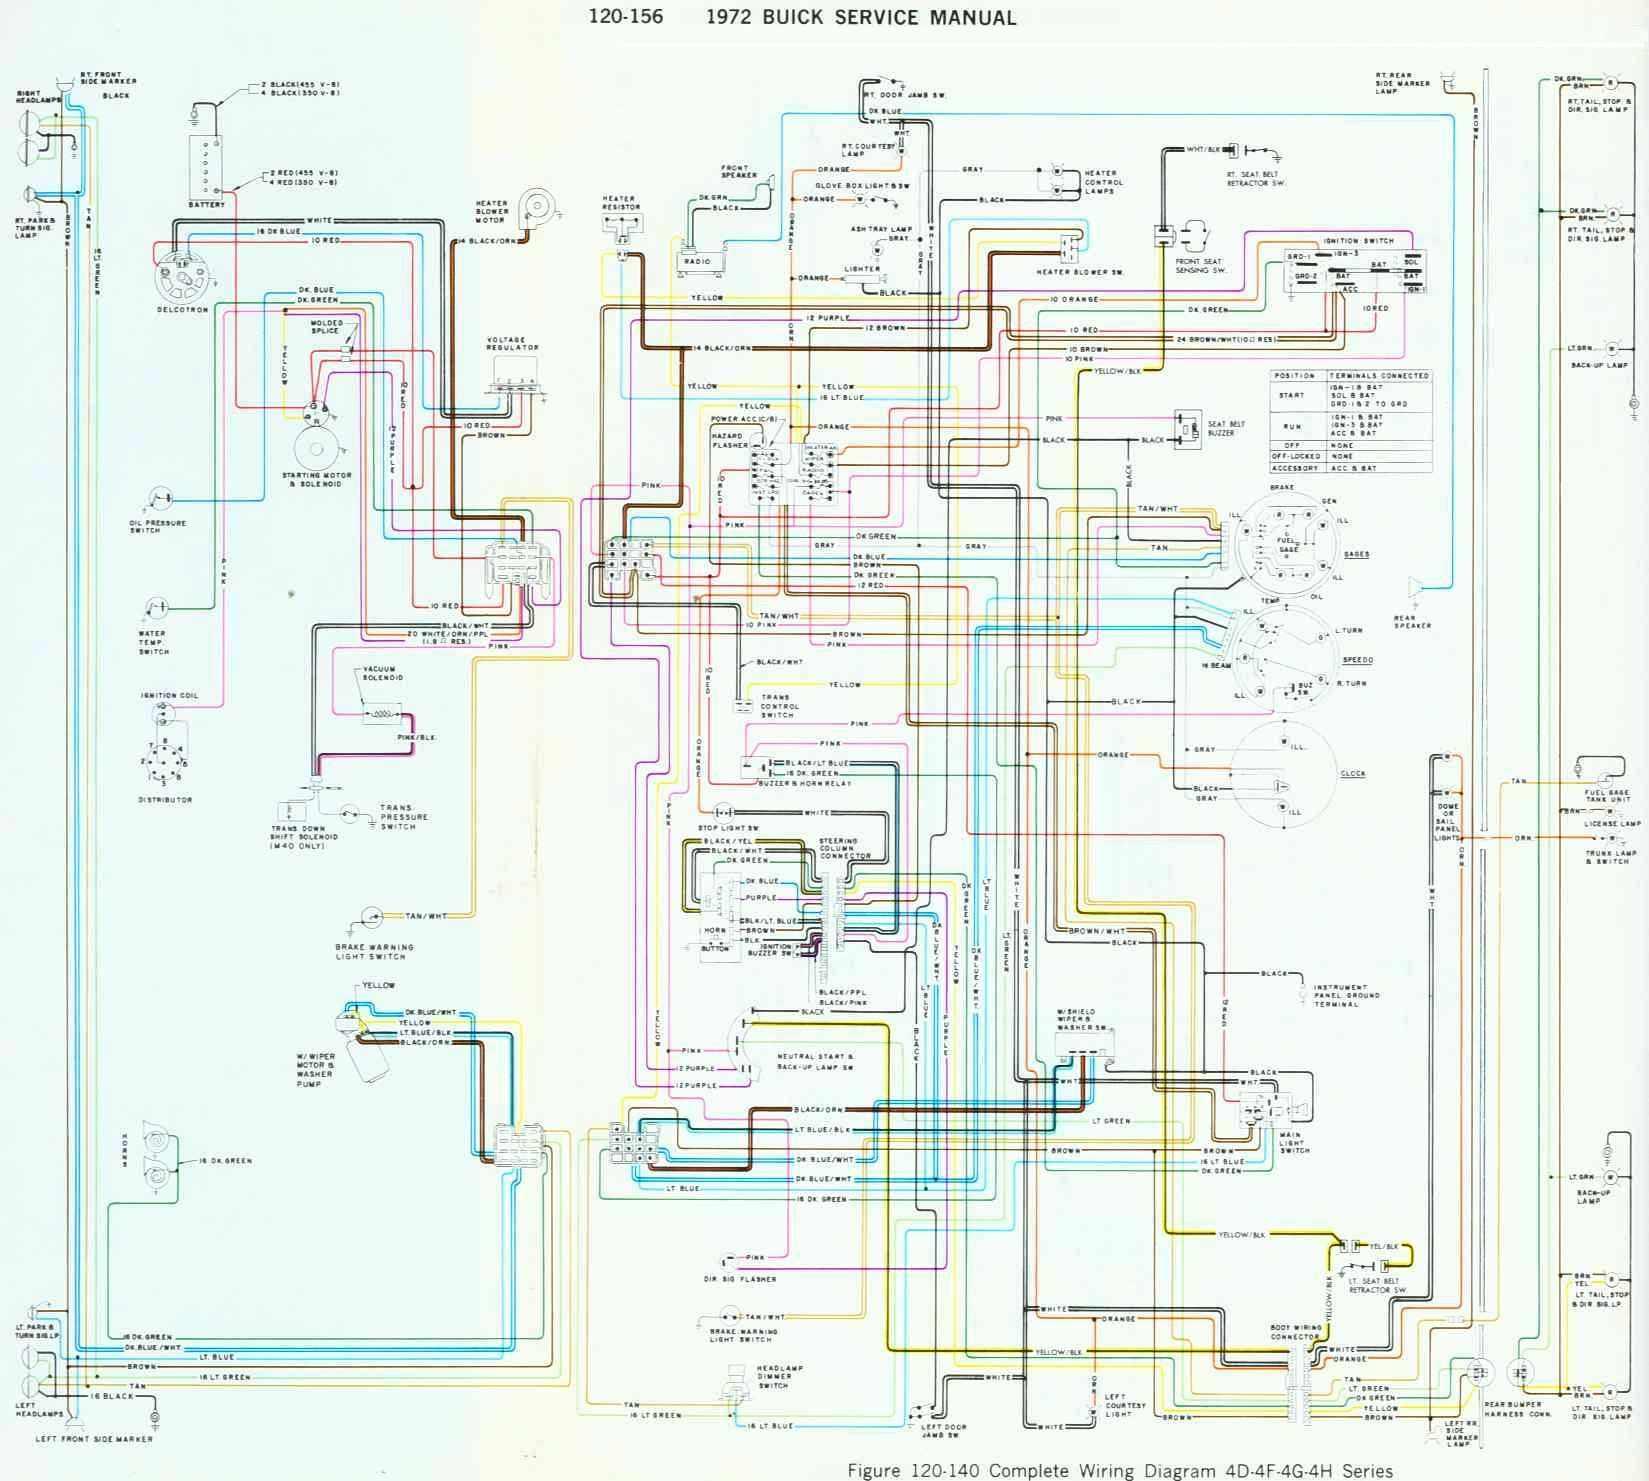 buick car manuals wiring diagrams pdf fault codes buick century wiring diagram buick rendezvous wiring diagram [ 1649 x 1481 Pixel ]